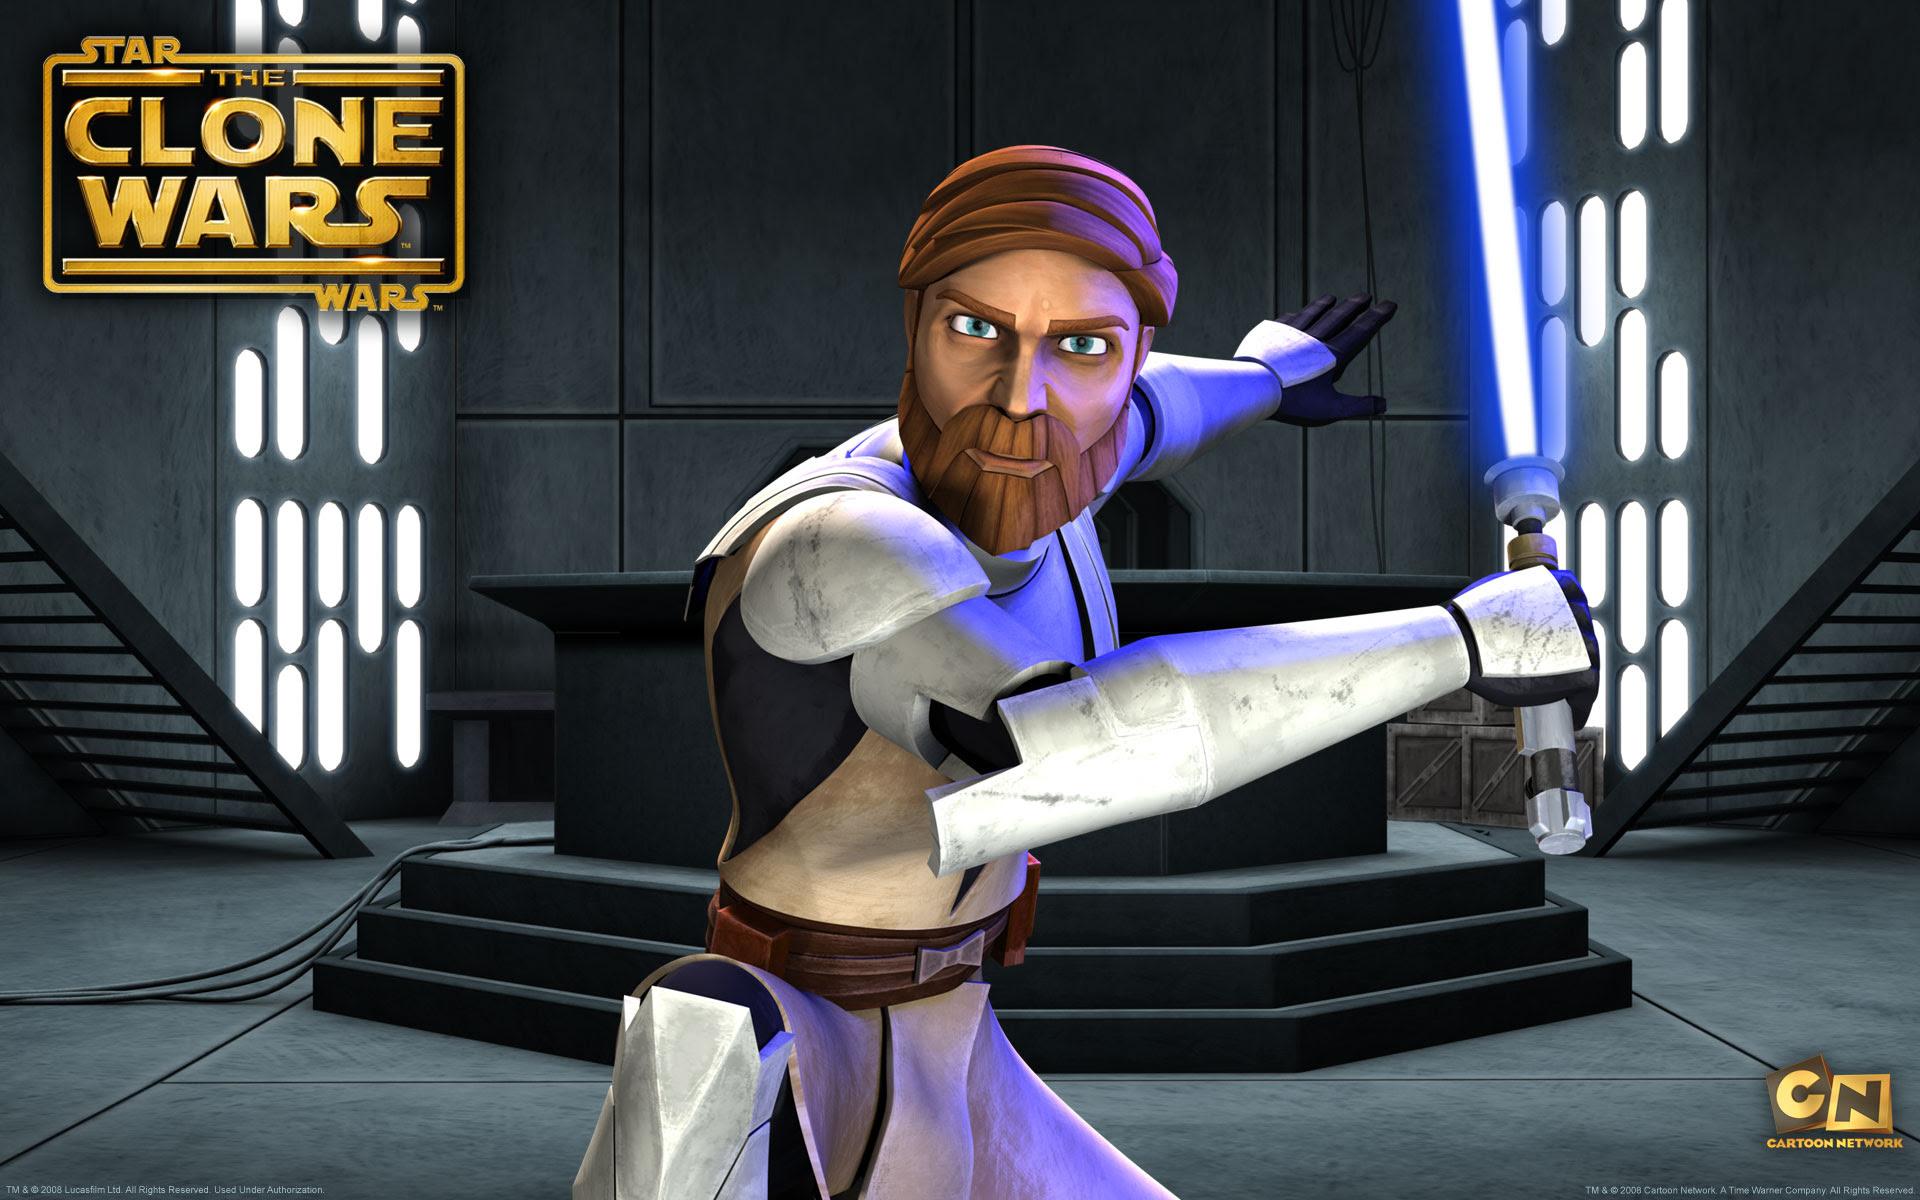 Obi Wan Kenobi From The Clone Wars Desktop Wallpaper